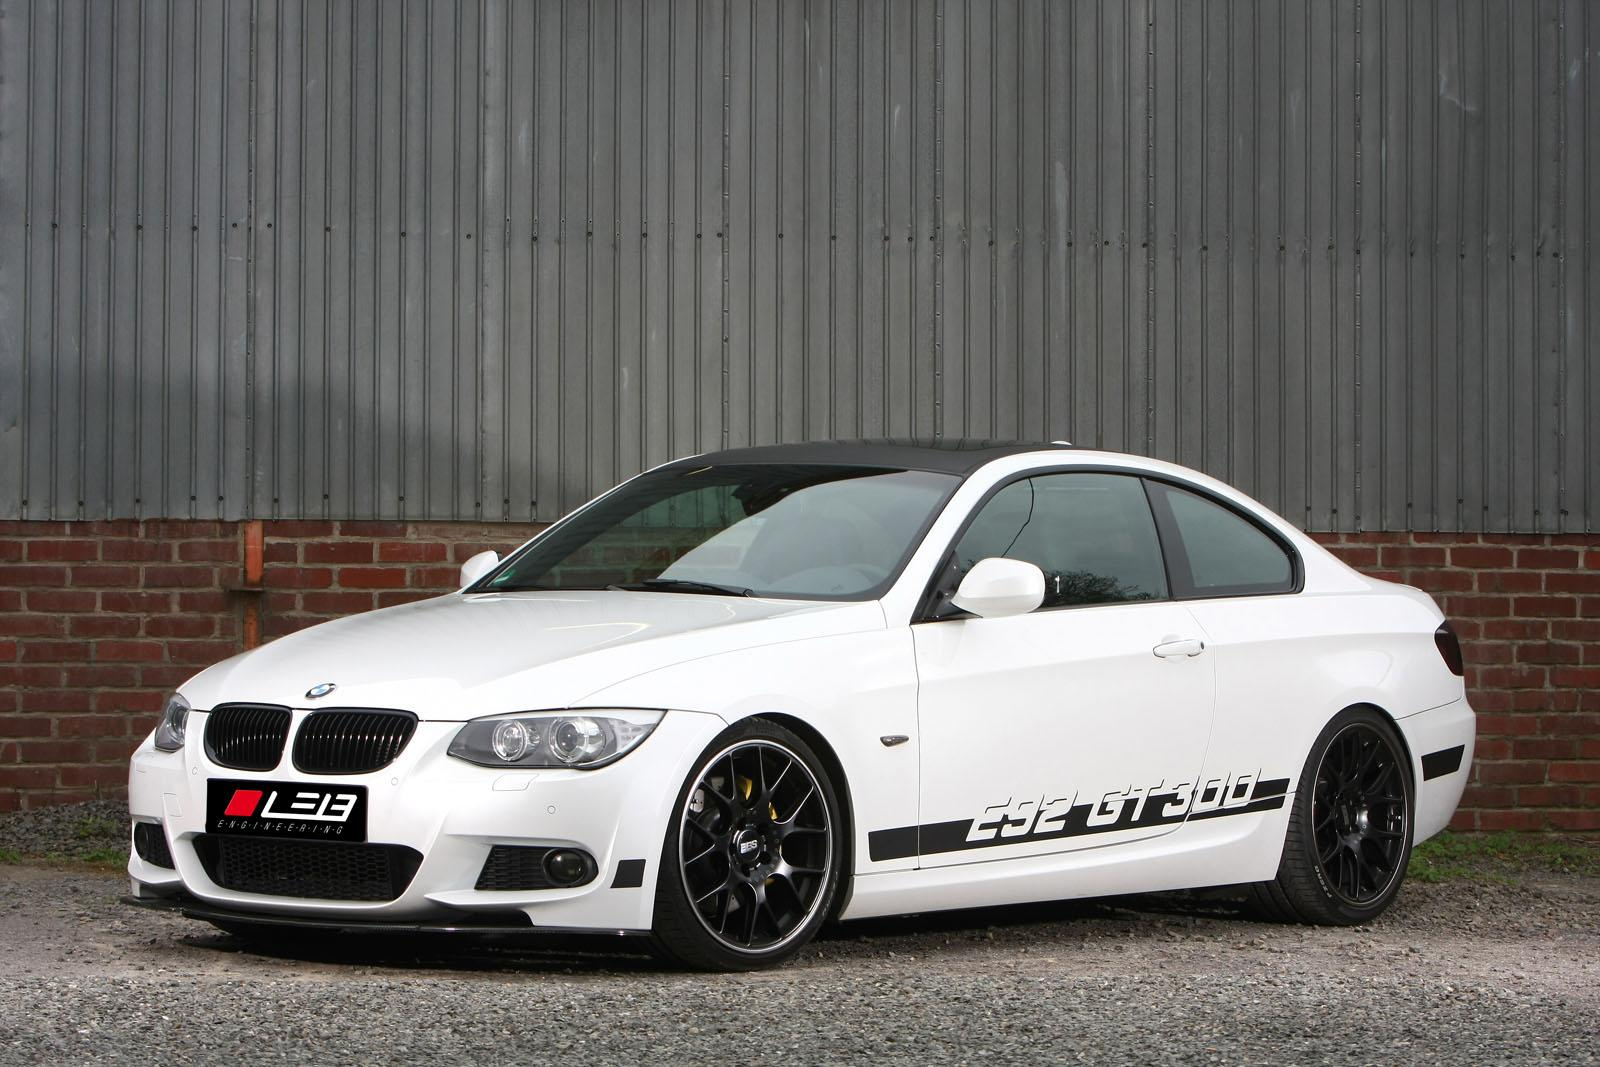 Leib Engineering BMW GT Kit Based On AWD I PerformanceDrive - Bmw 325i gt